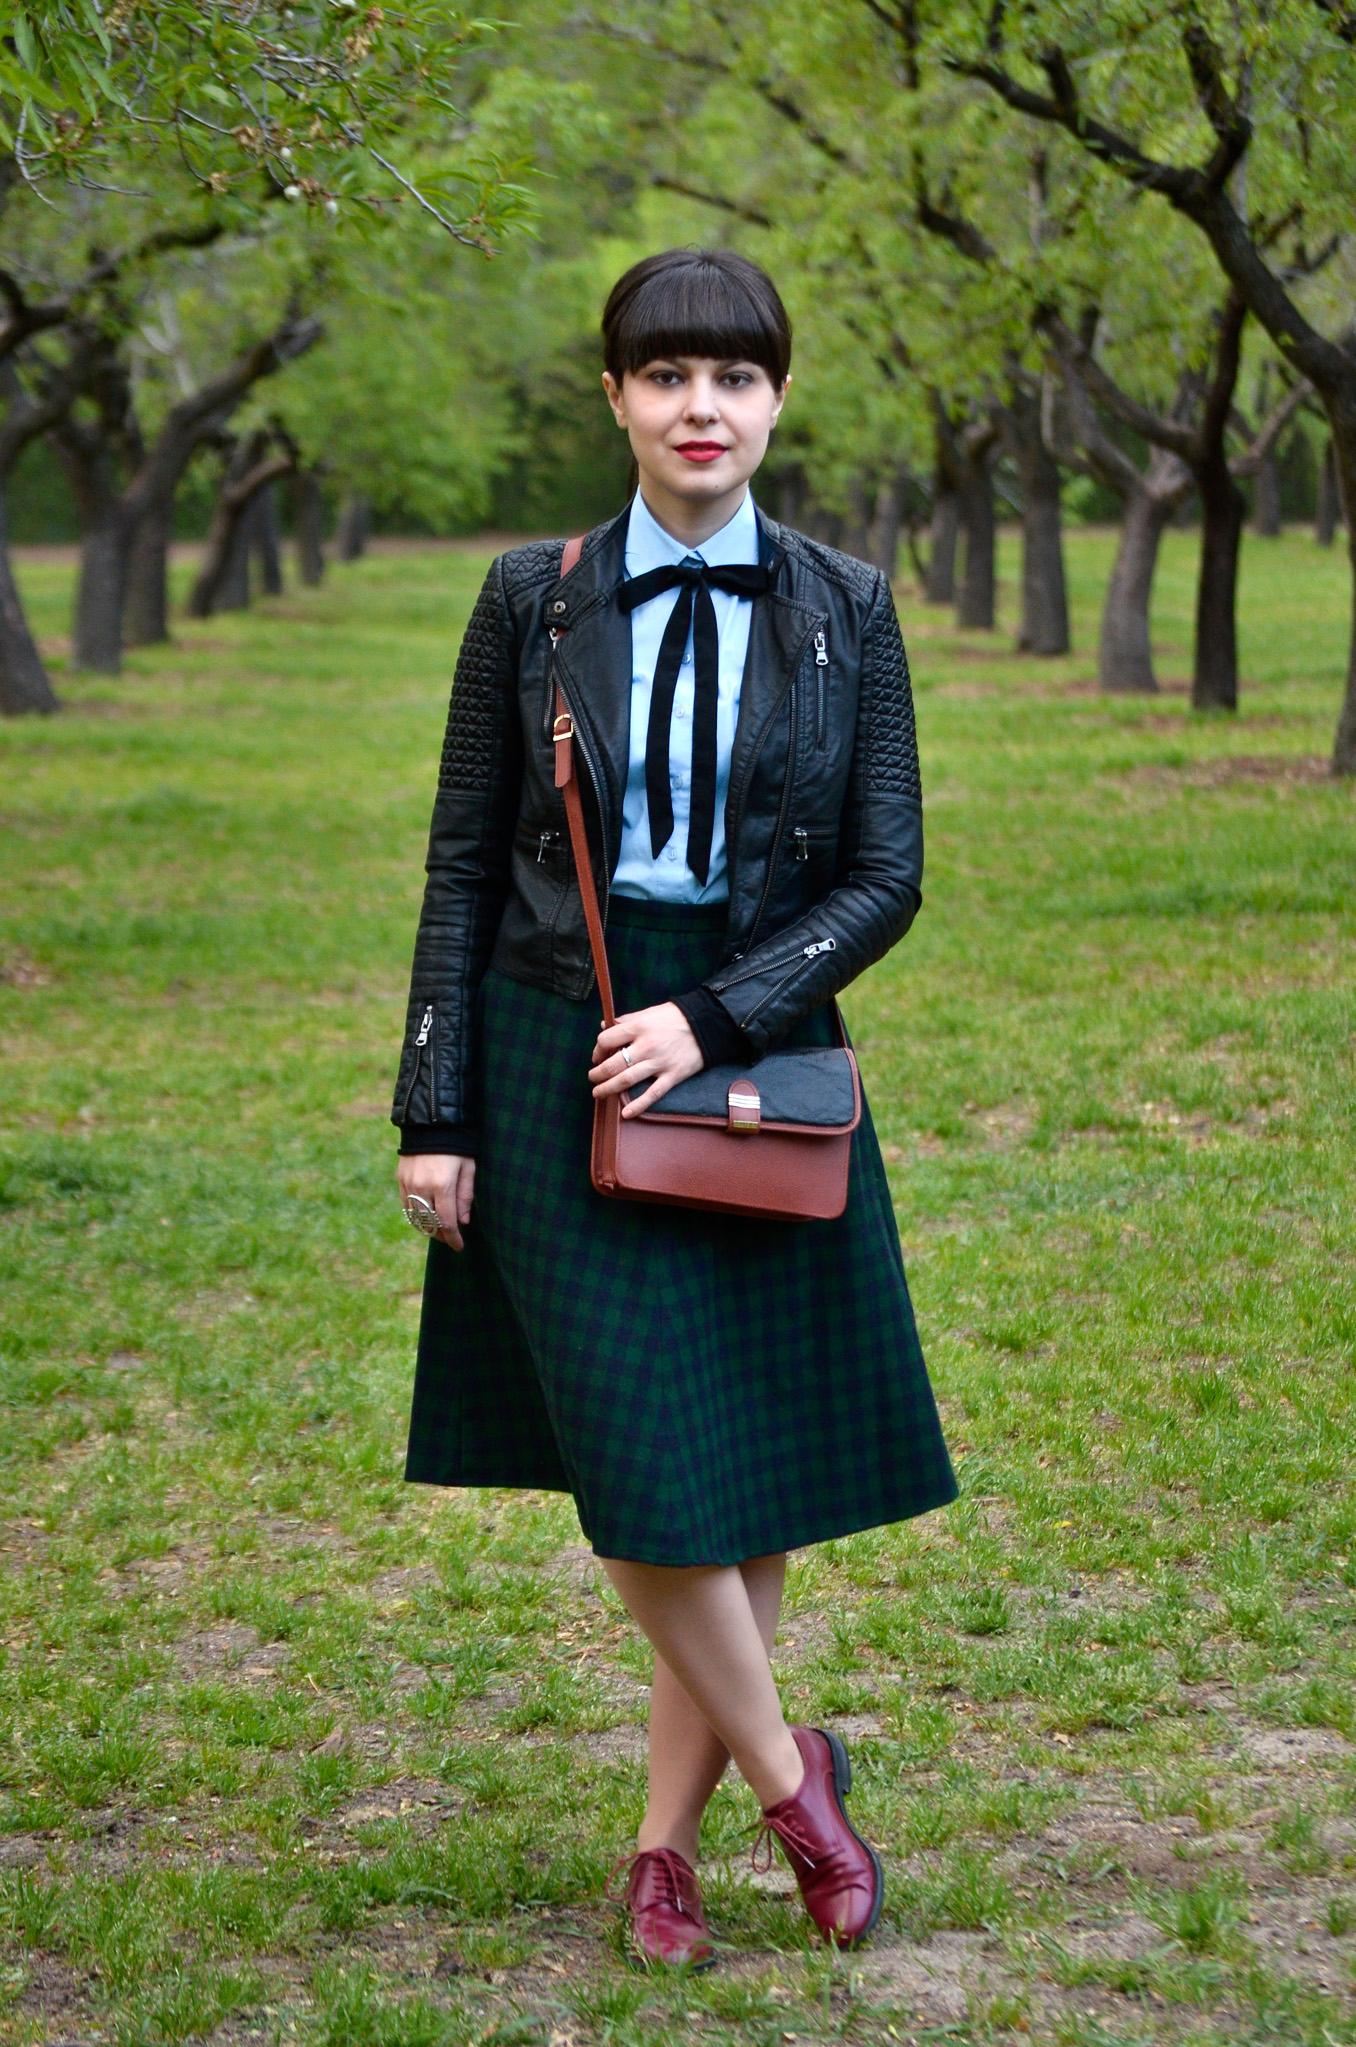 school girl outfit in madrid green tartan midi skirt thrifted brown bag satchel sky blue shirt black bow tie bangs burgundy oxford shoes poema spring green fresh park